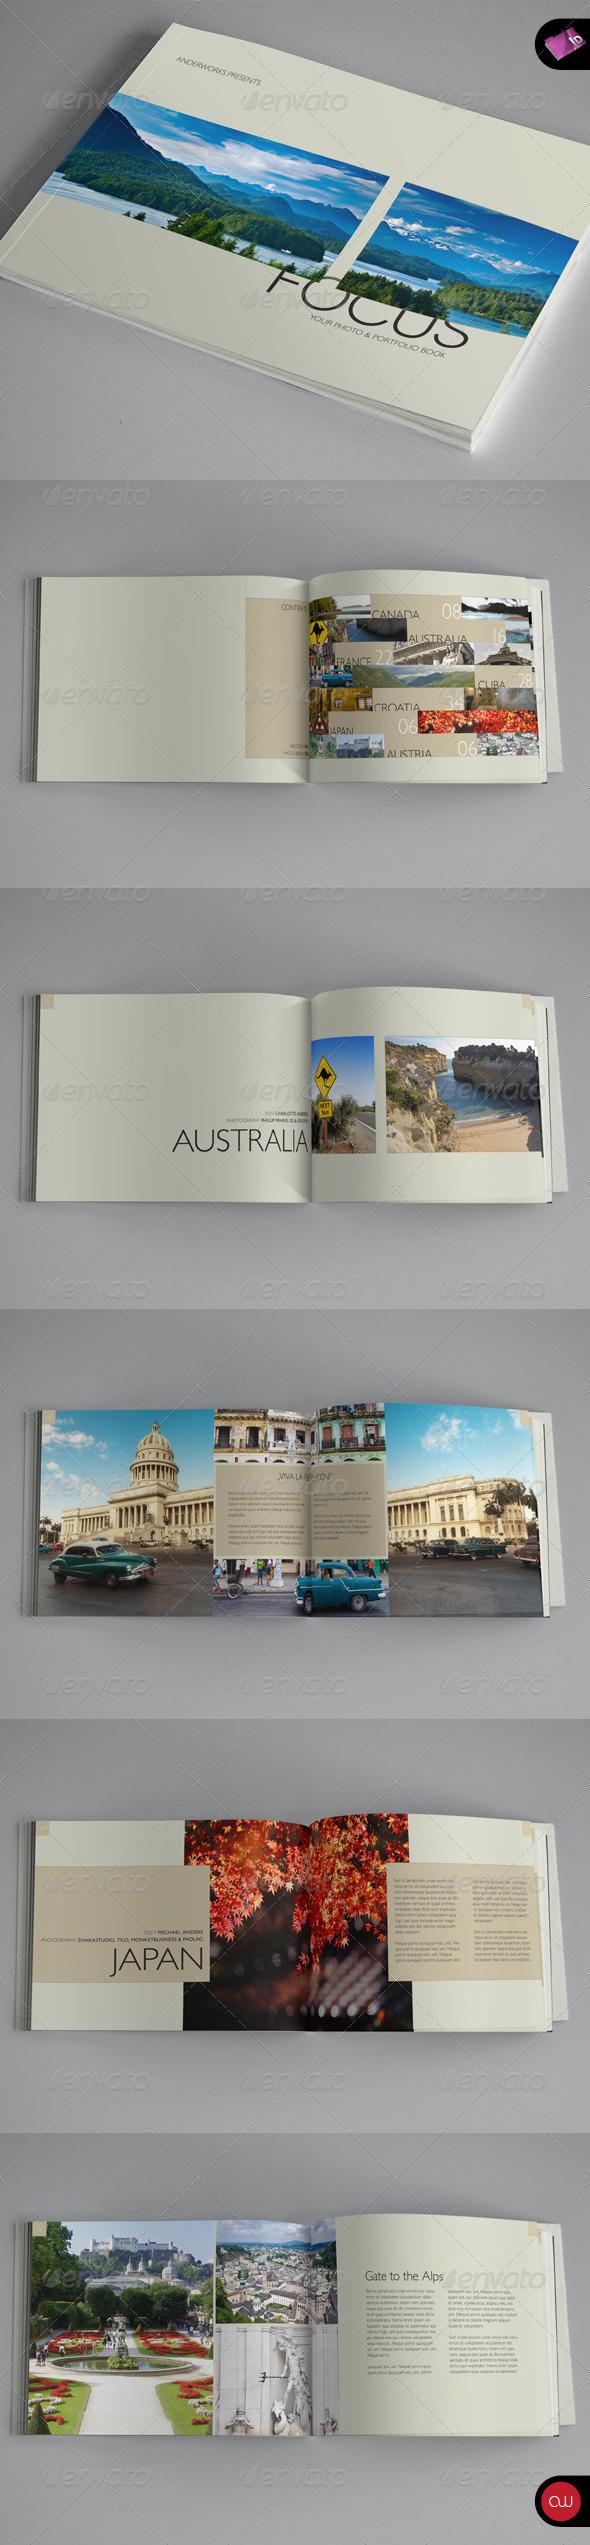 GraphicRiver Book & Brochure Focus Series 1990492